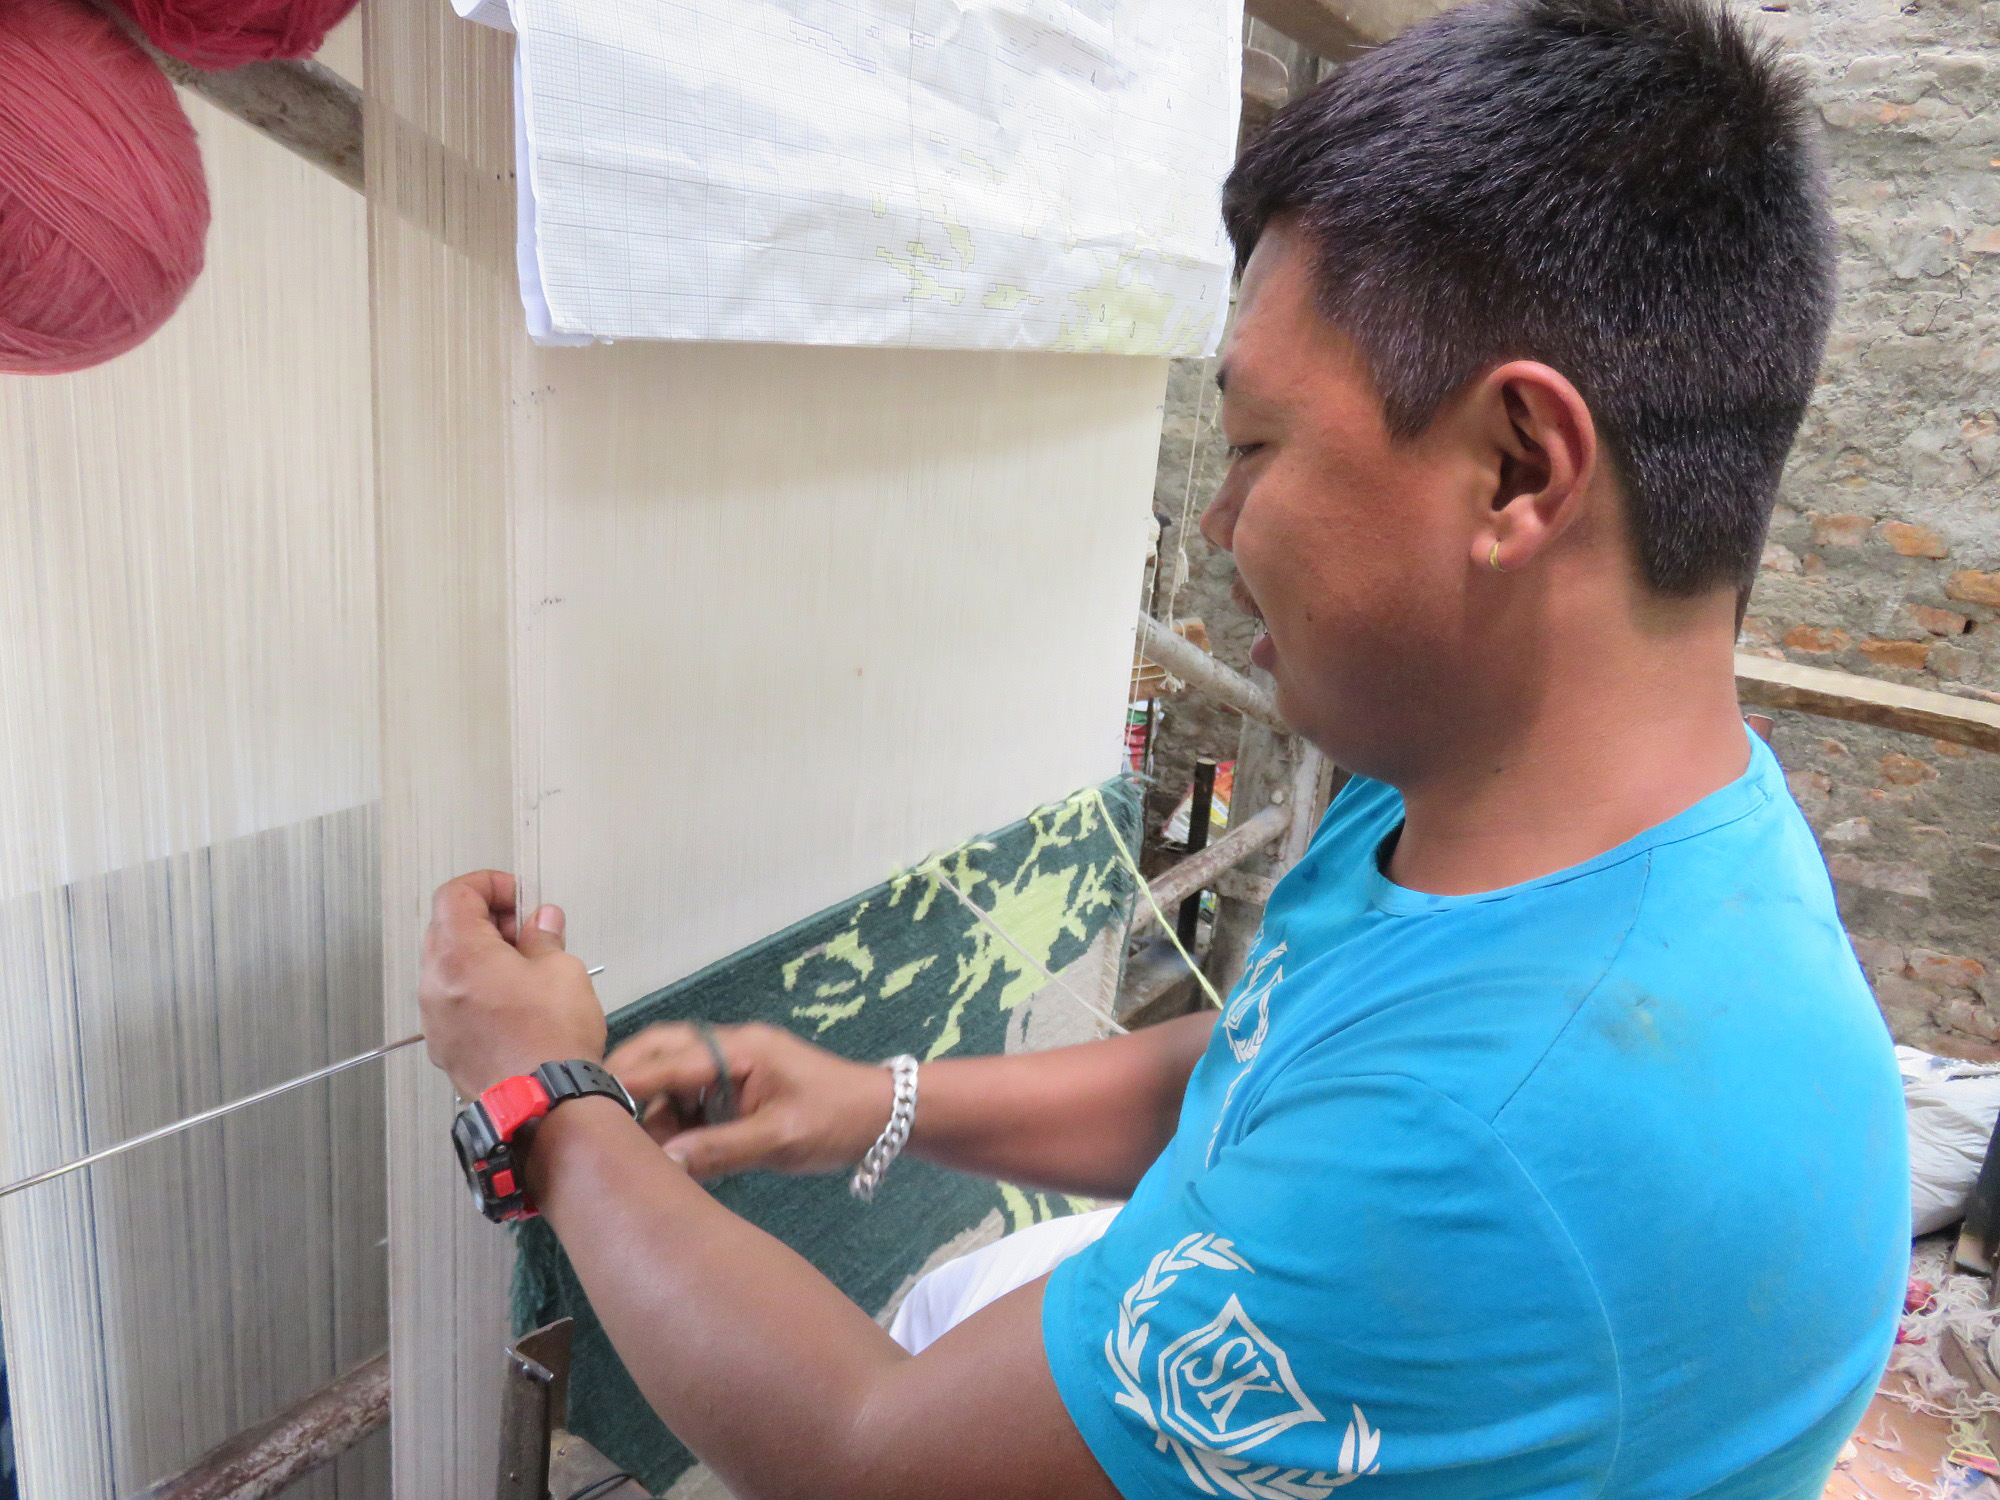 Rug weaver in Nepal for Gina Pierce